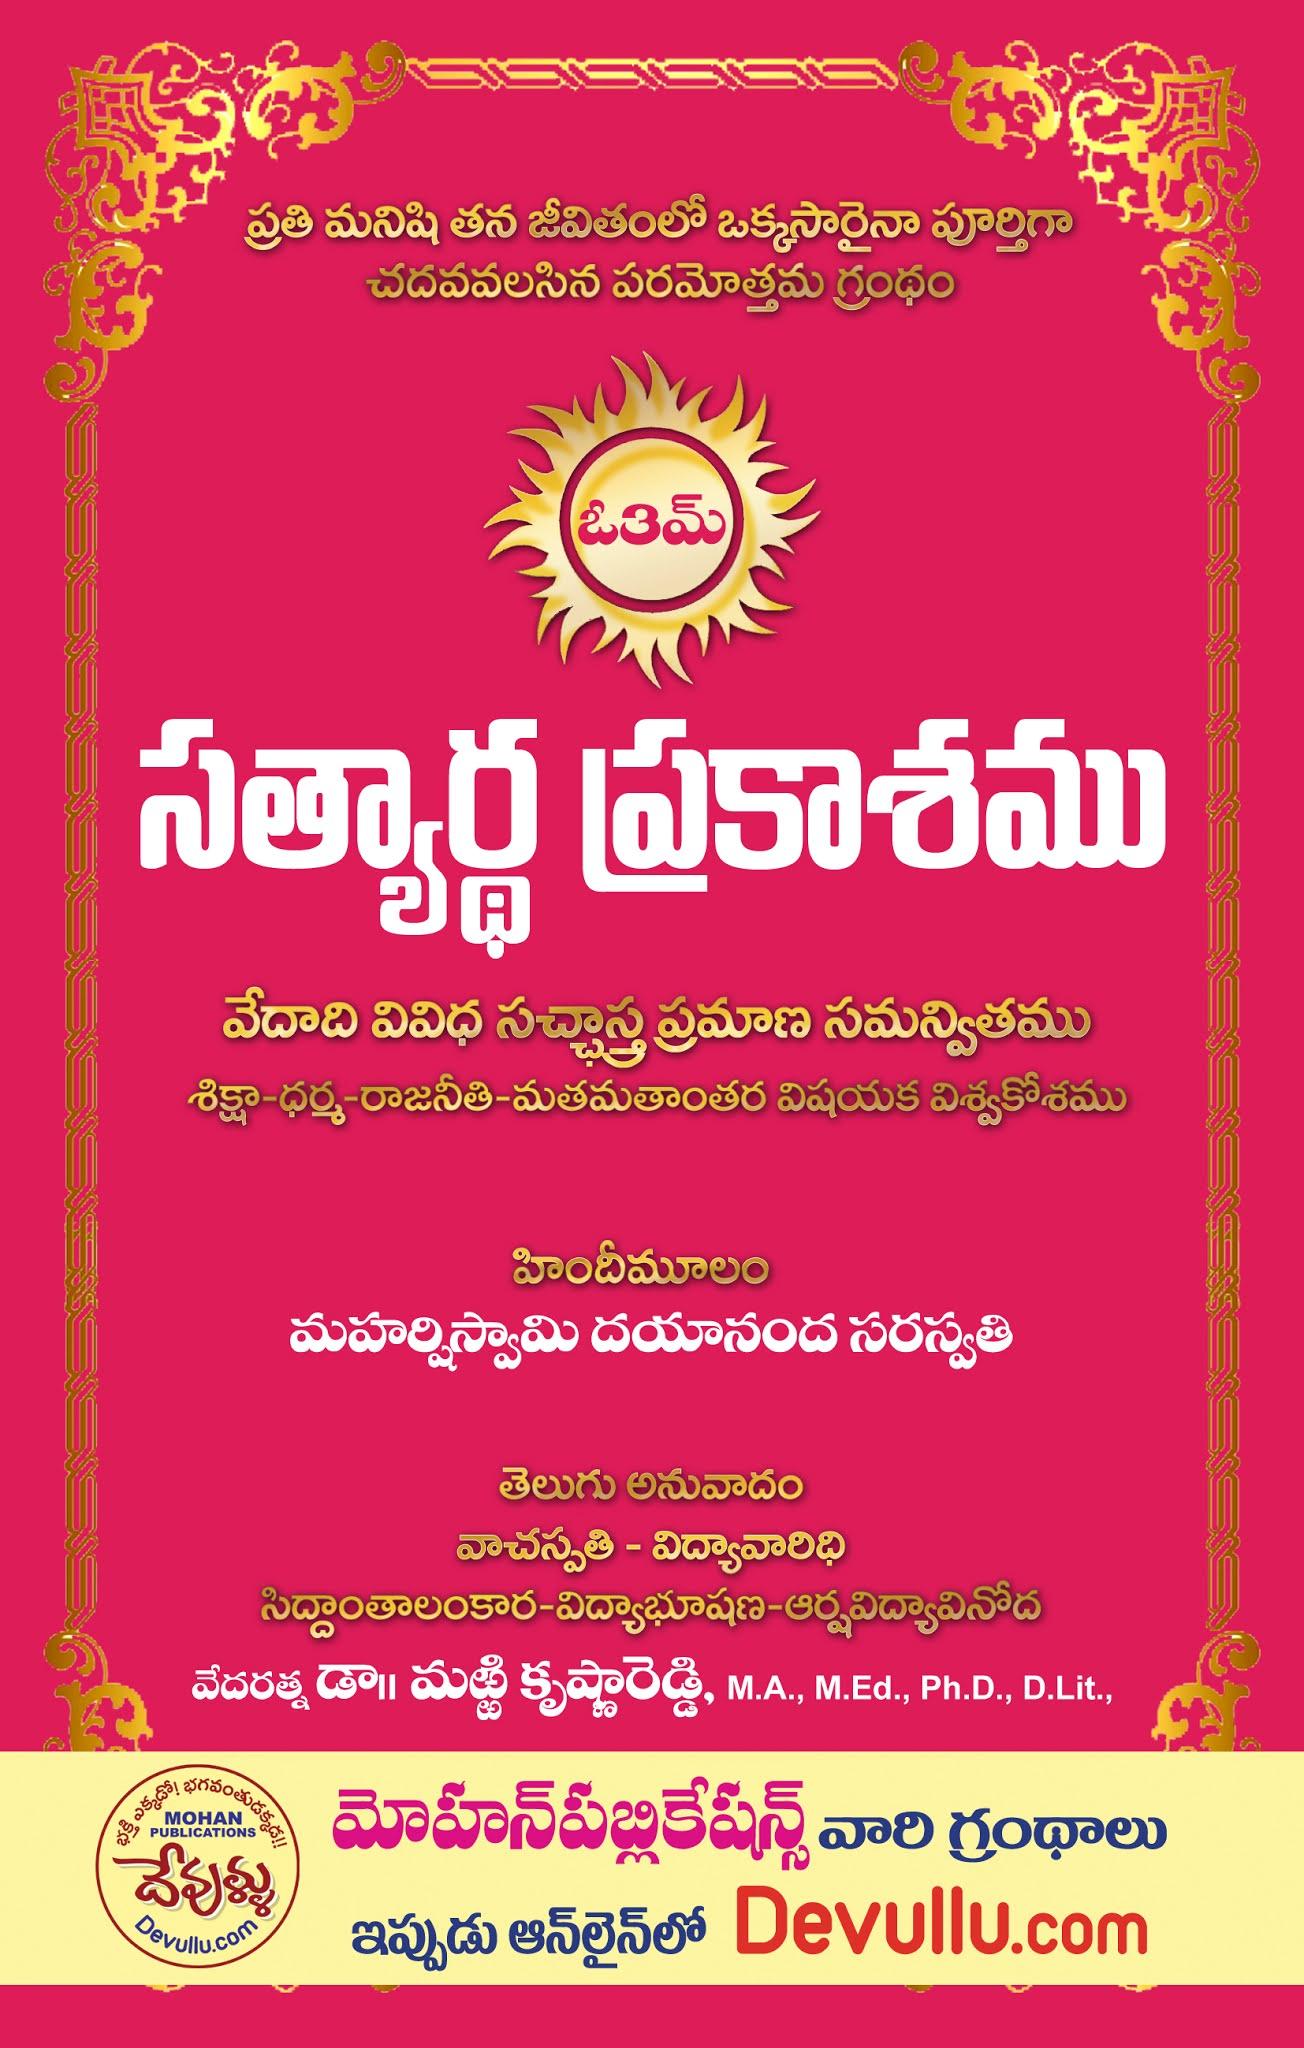 Satyartha Prakasham Telugu | -Swamy Dayananda Saraswathi | సత్యార్థ ప్రకాశం | -స్వామి దయానంద సరస్వతి